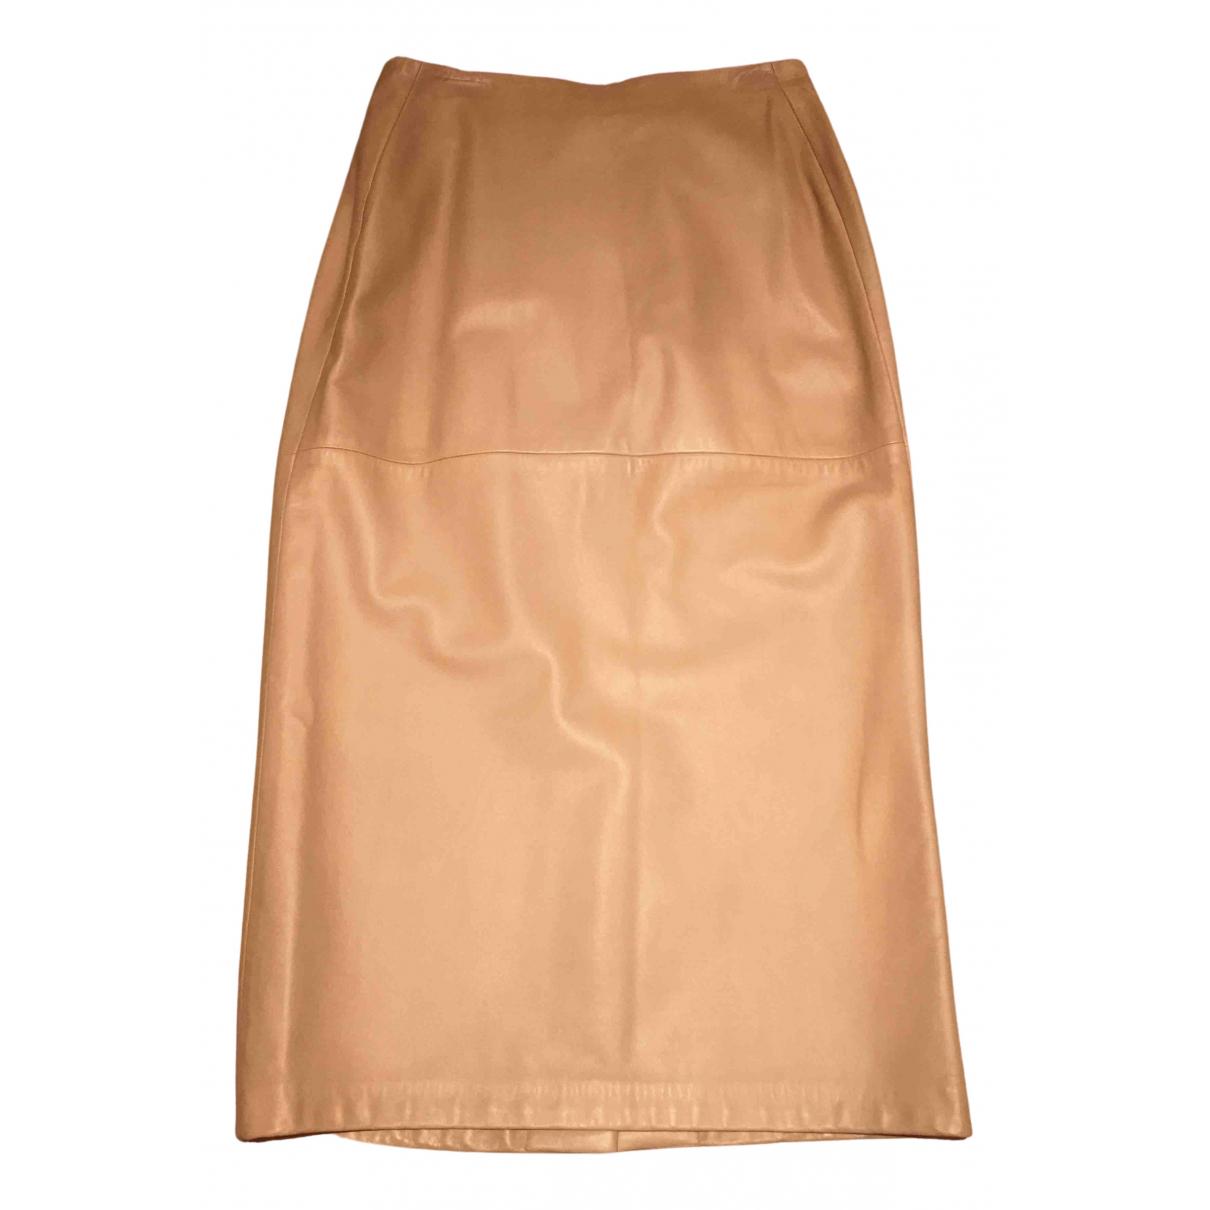 Donna Karan - Jupe   pour femme en cuir - camel